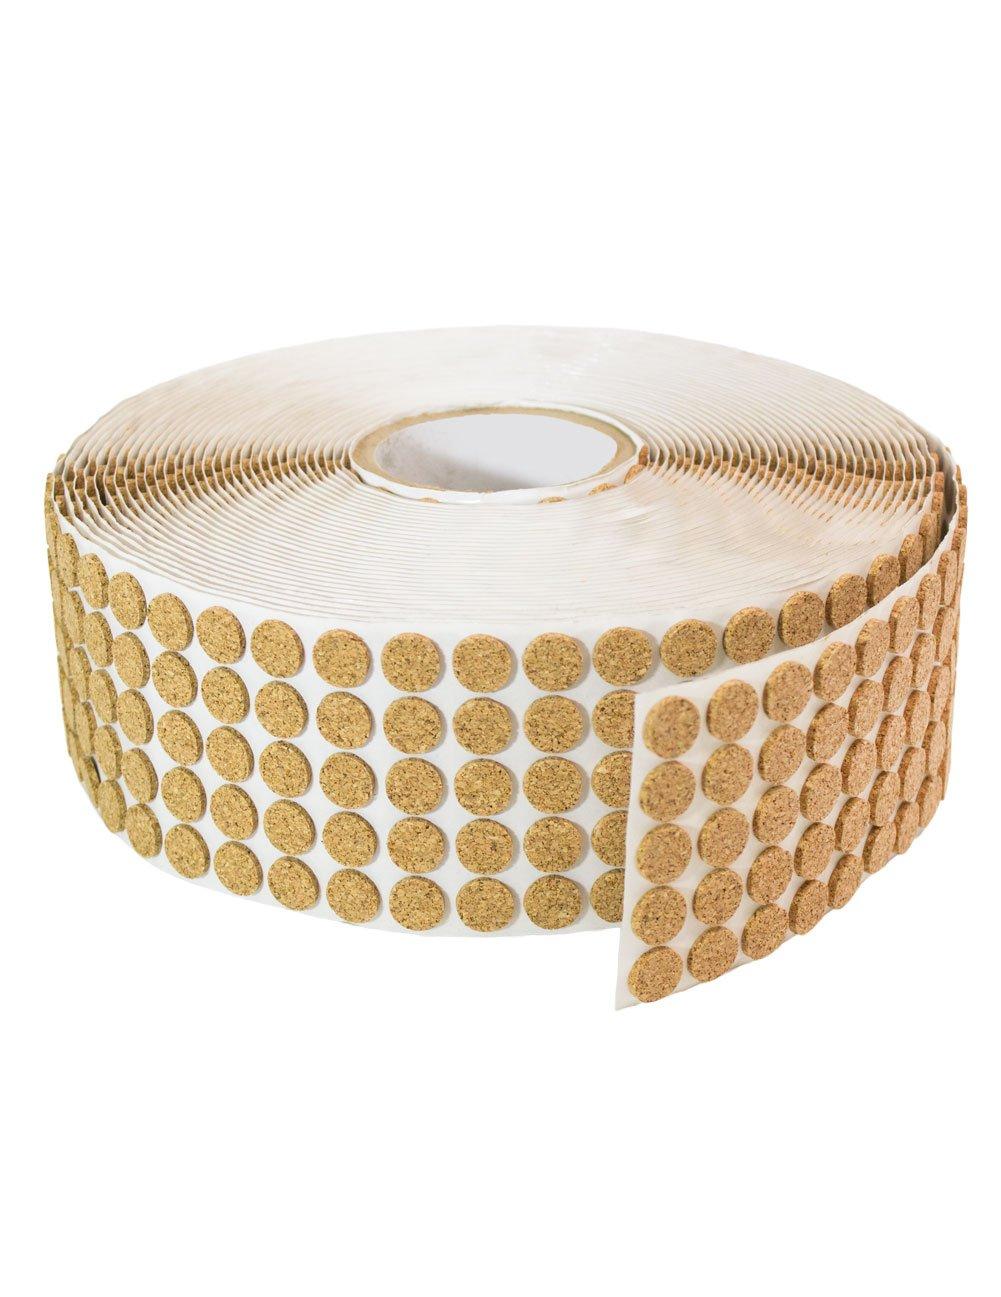 Adhesive Kiss Cut Cork Button Rolls: 3/8'' Dia, 1/8'' Thick (6000 Pcs)